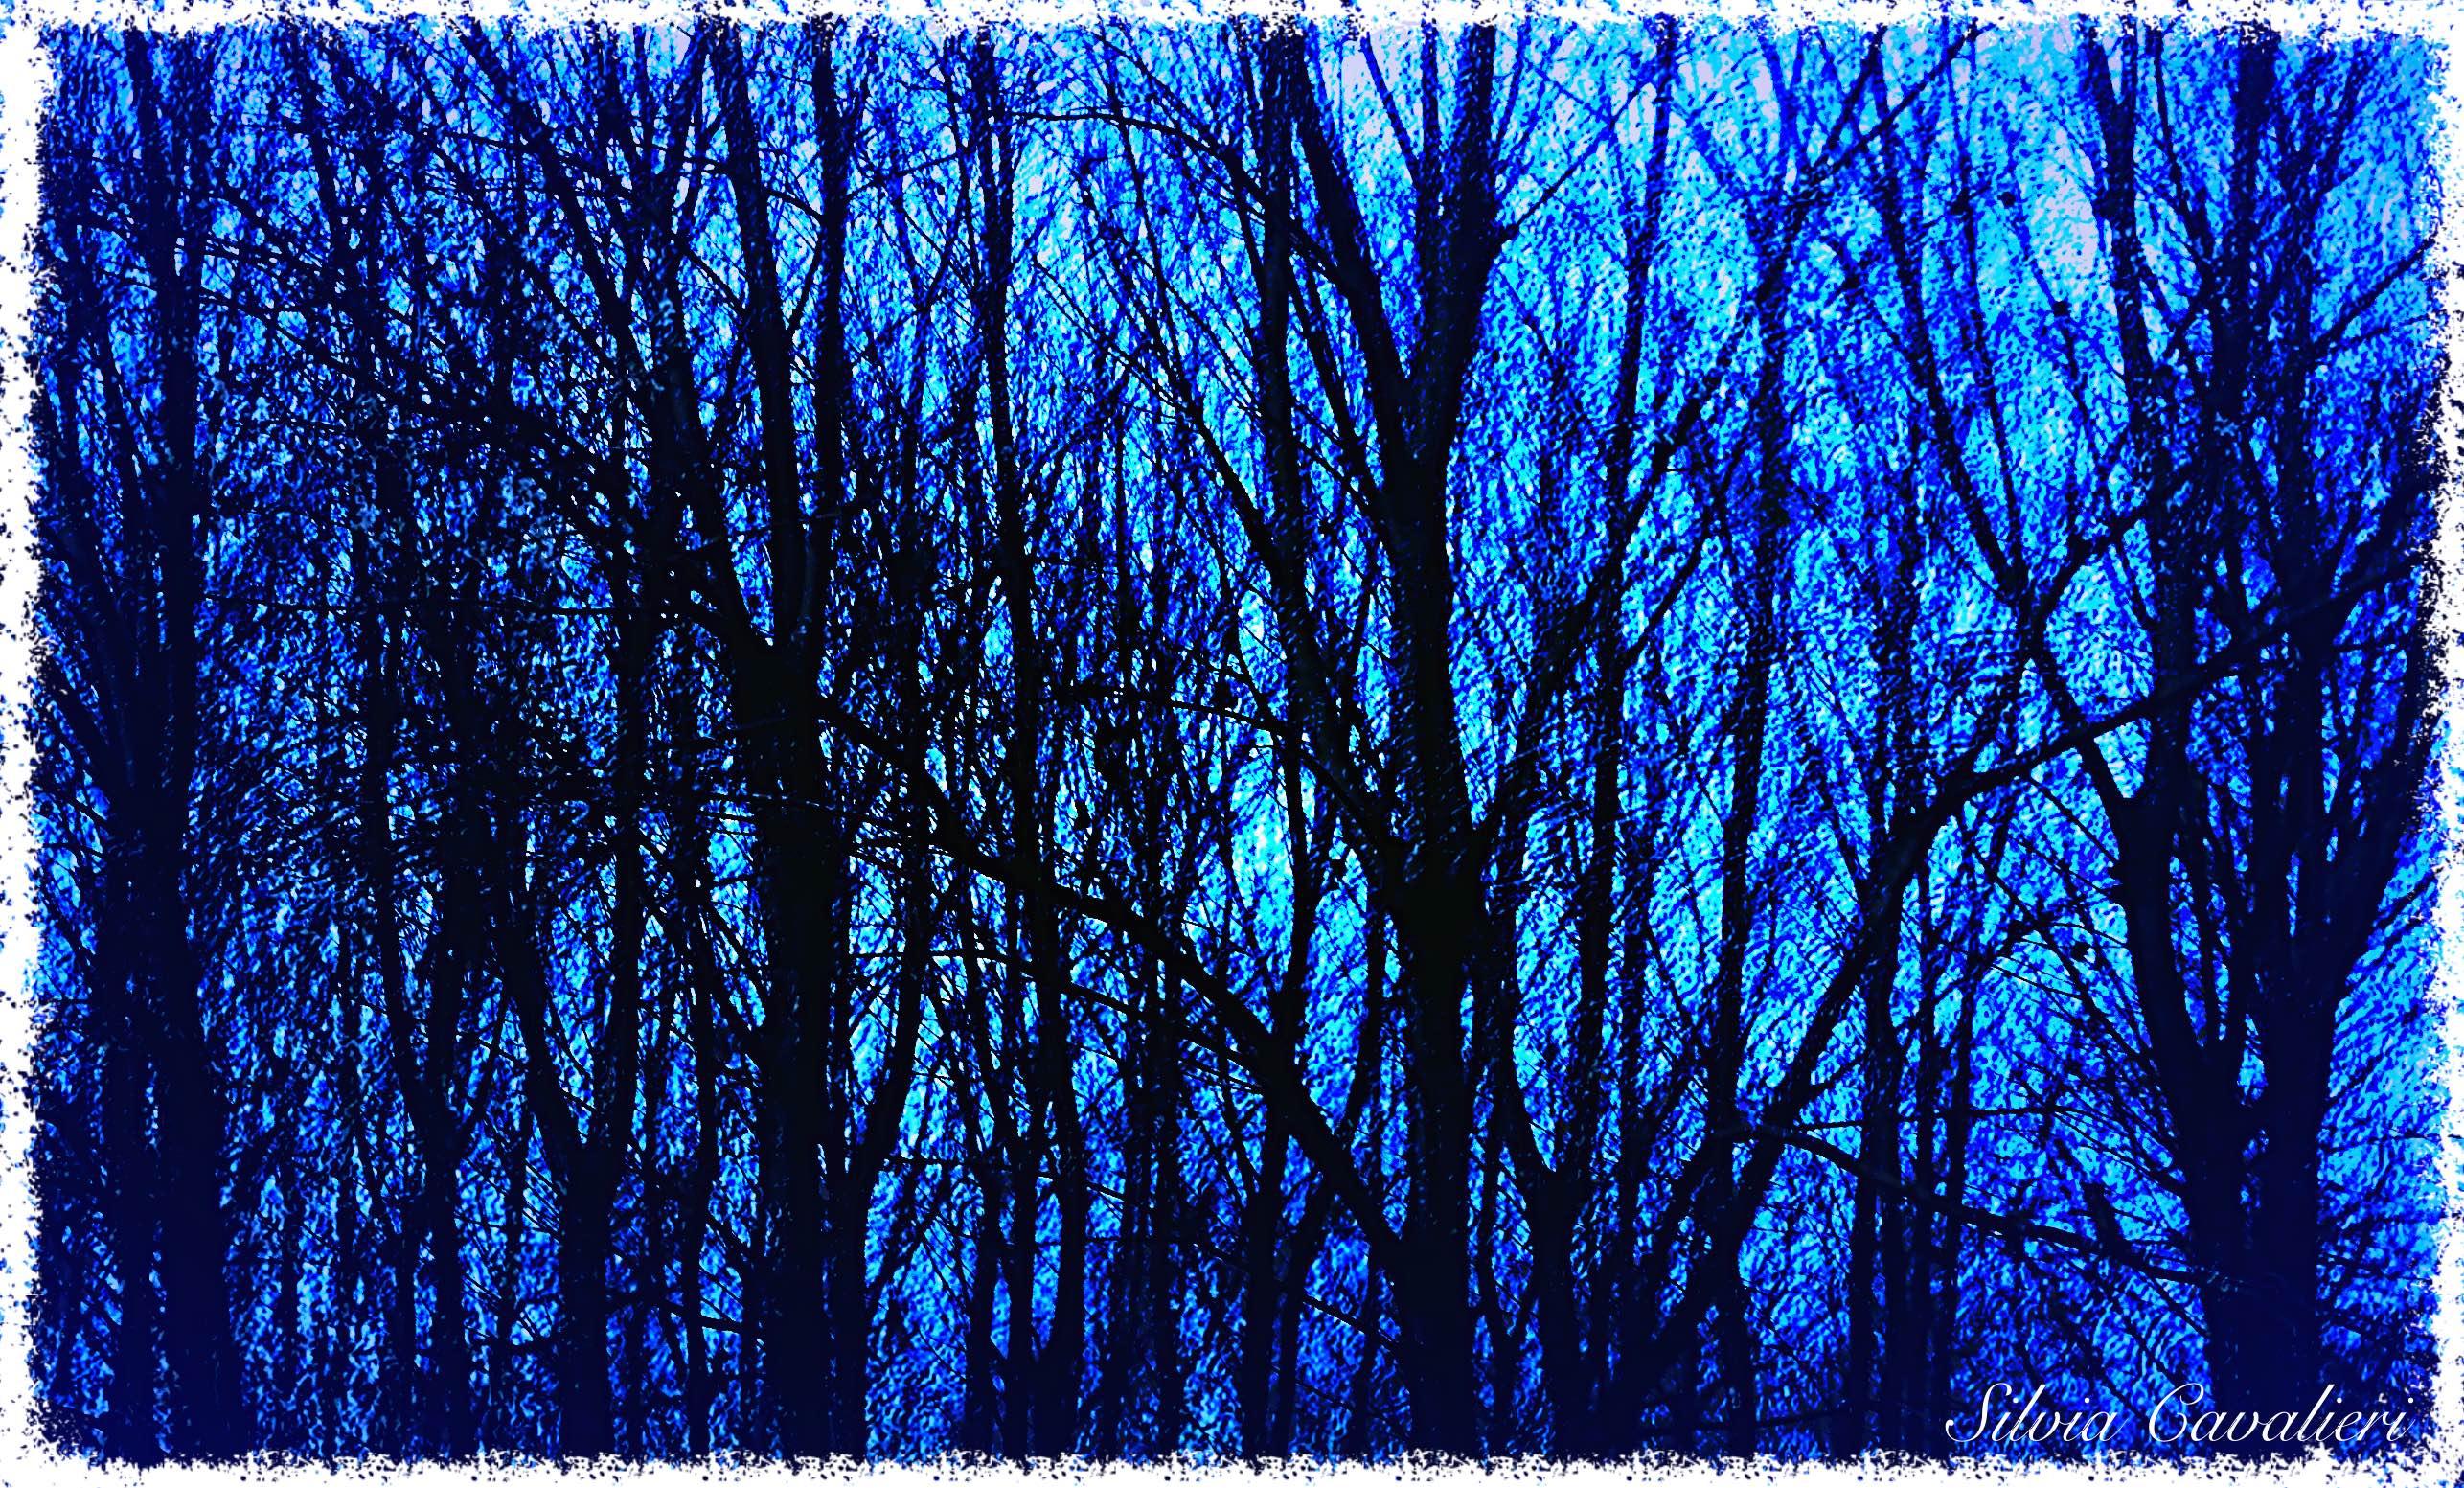 bosco-nudo